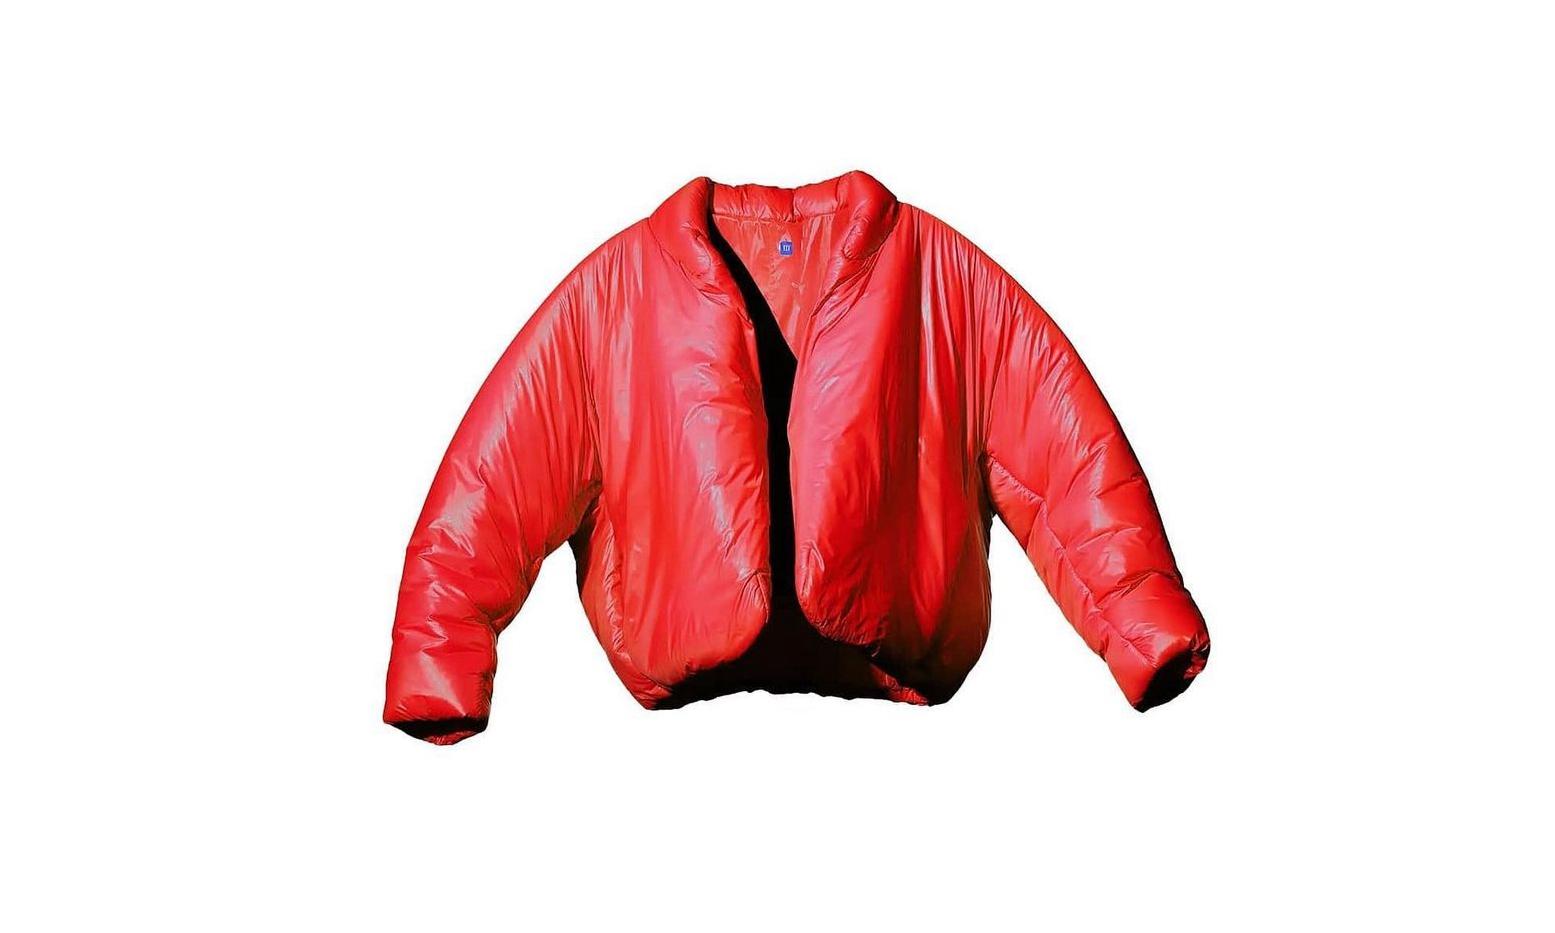 YEEZY GAP 或将为圆夹克推出第 3 款配色